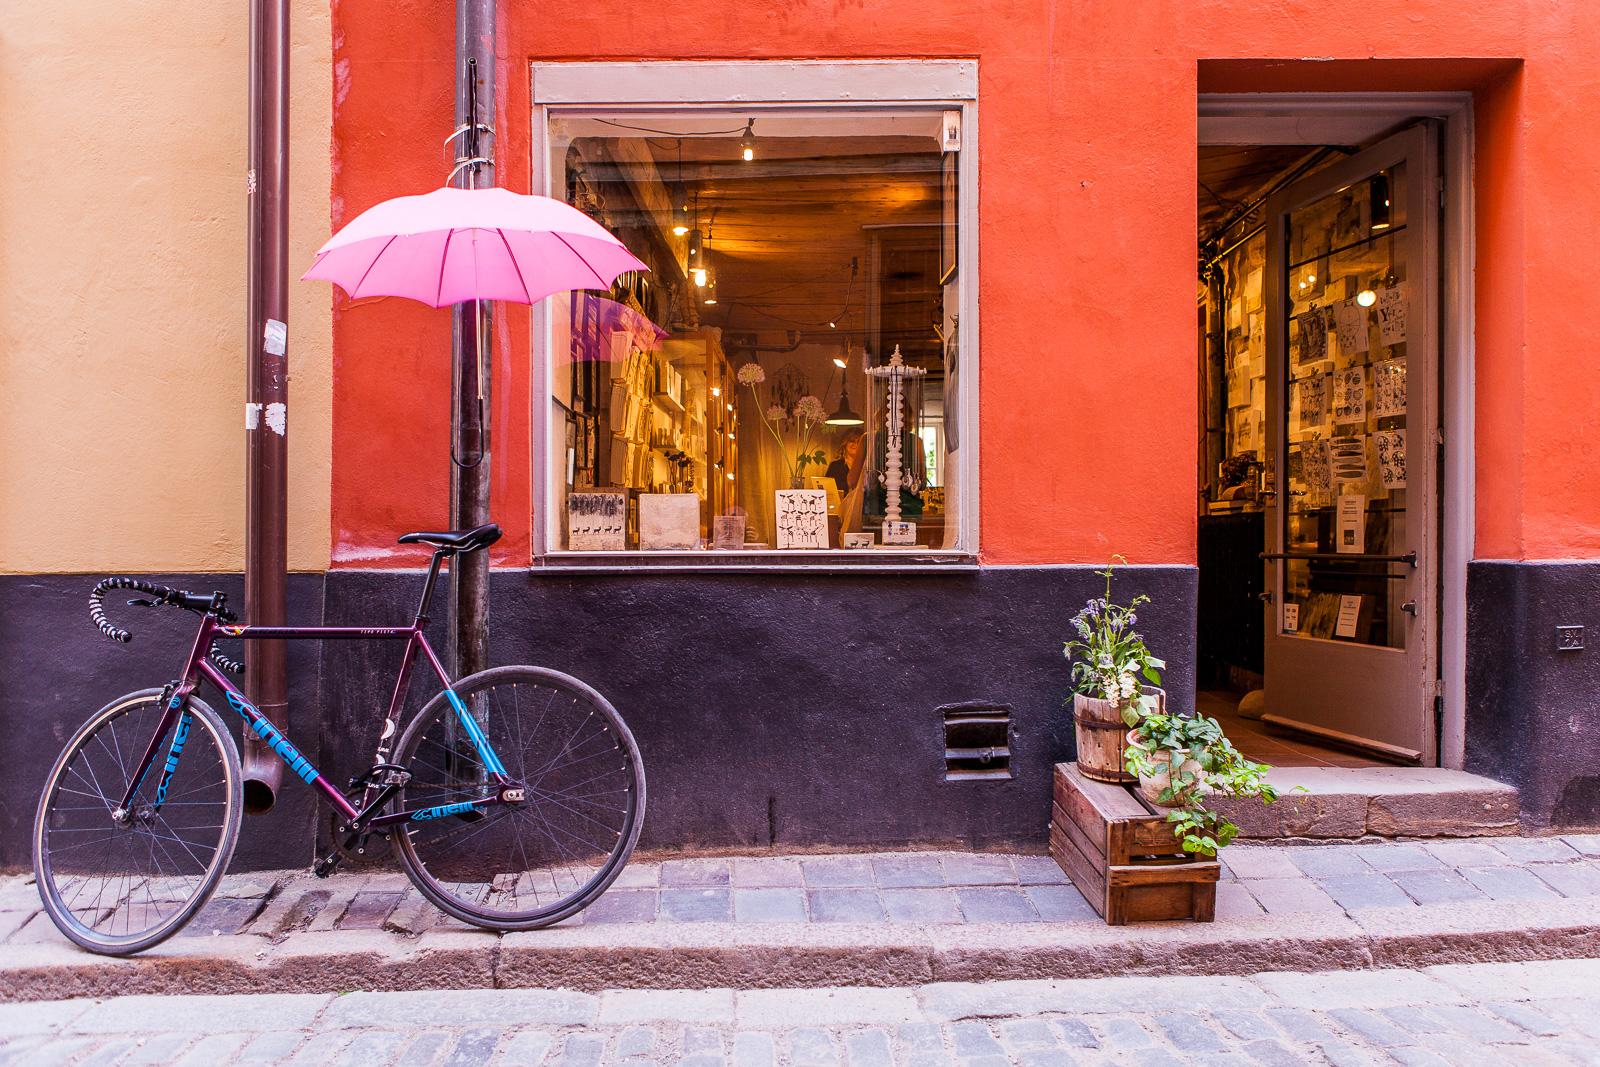 Stockholm Street Scene - Iain McLach